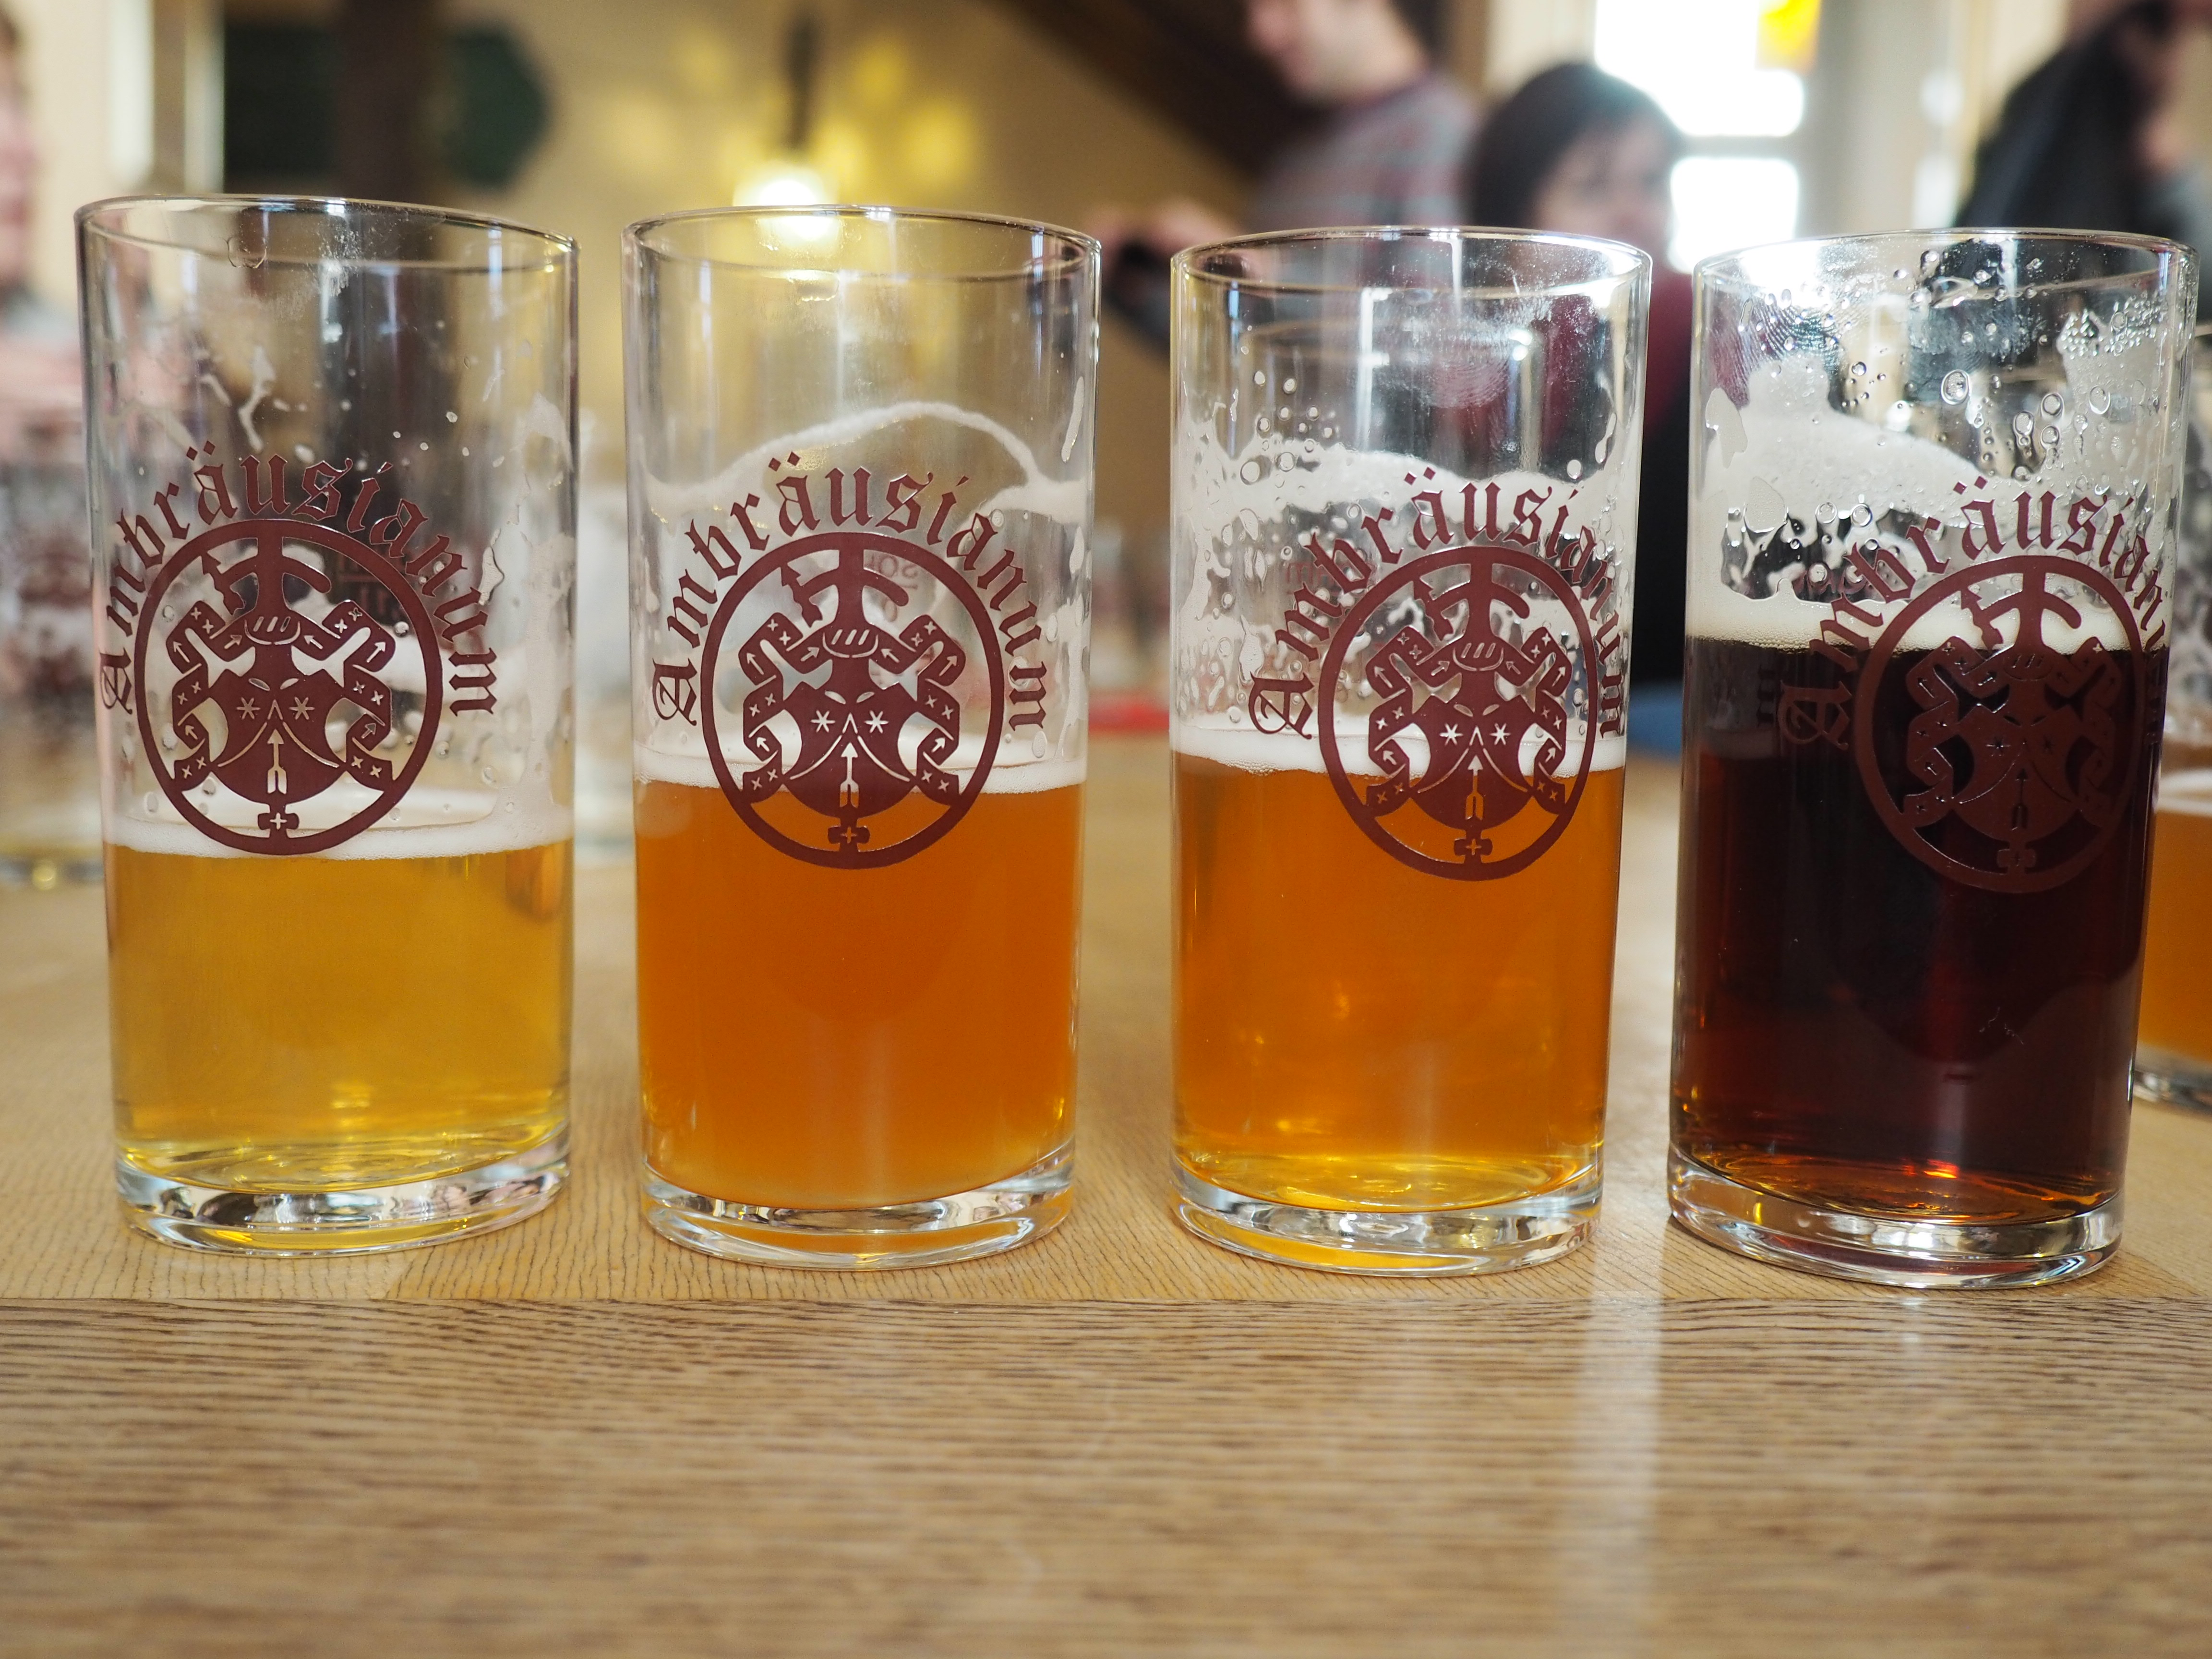 Leckere Bierprobe bei unserer sehr interessanten Bierführung in Bamberg